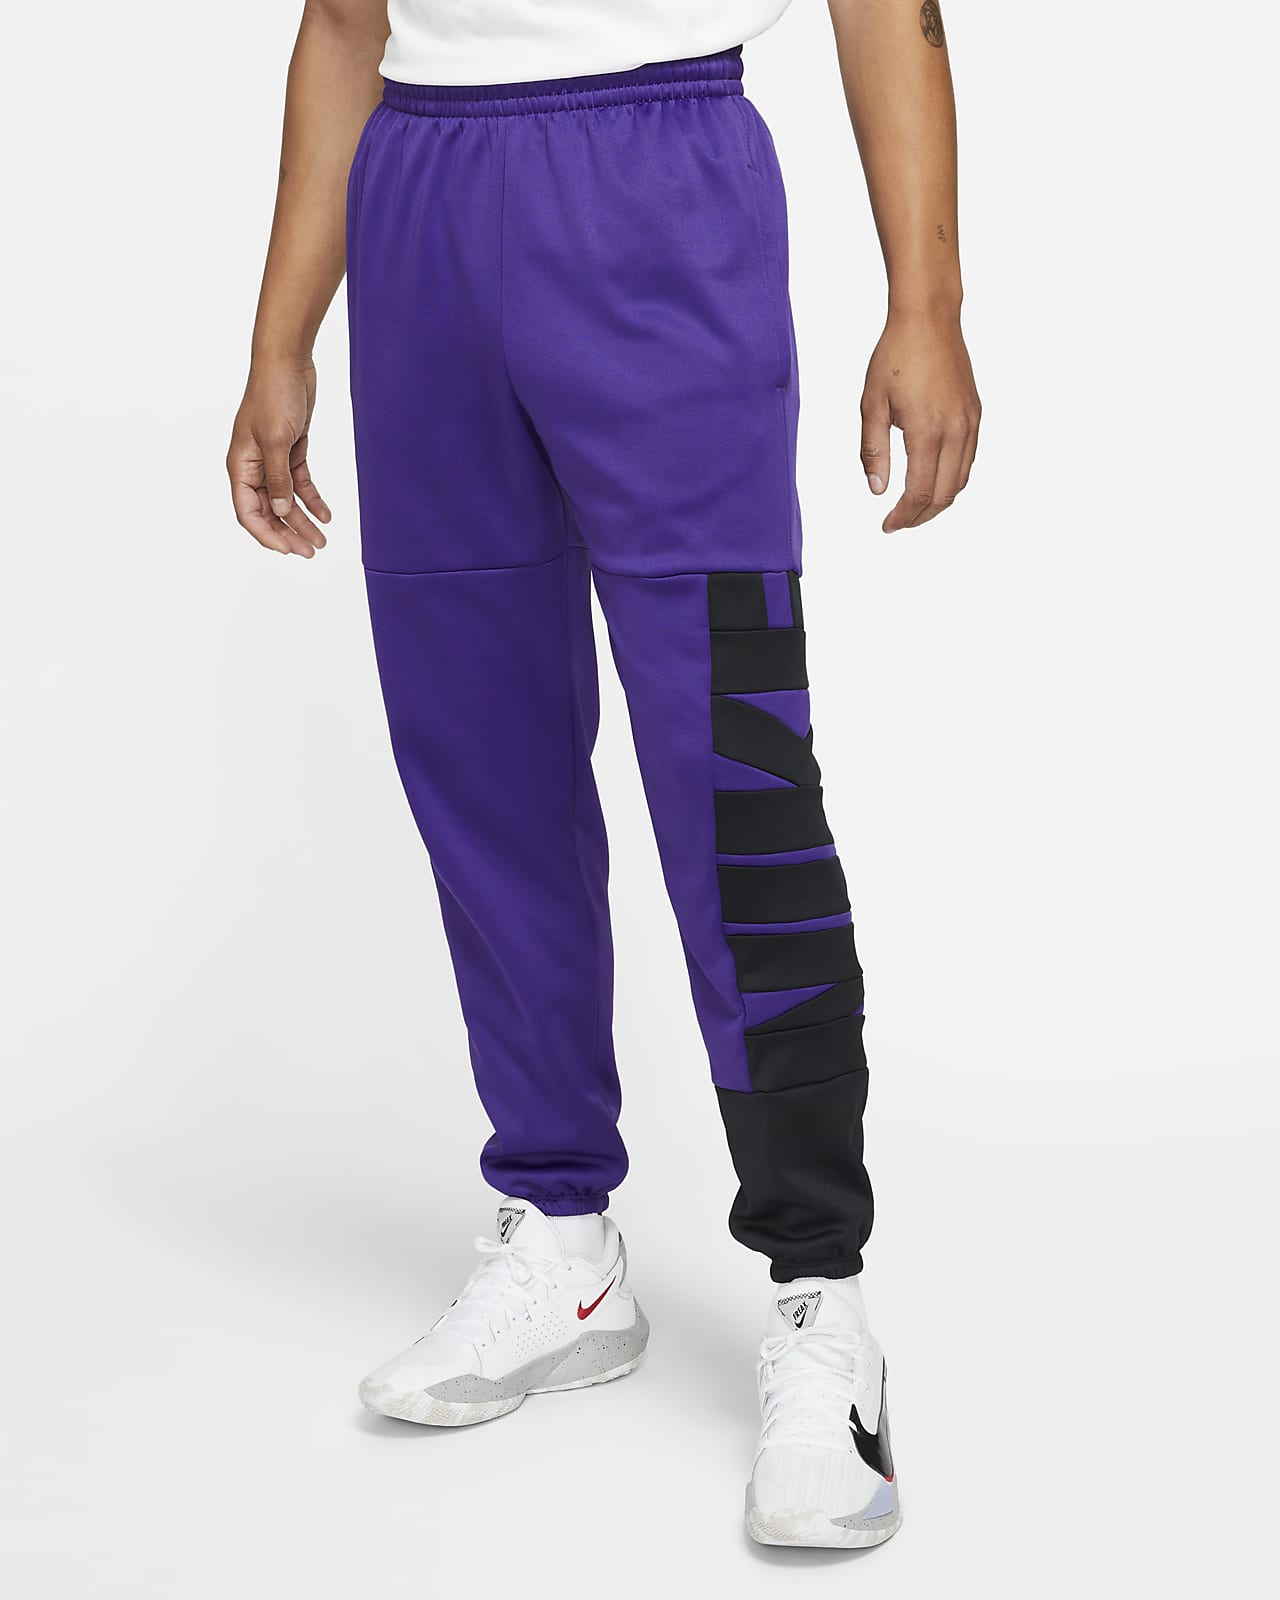 Nike Therma-FIT Men's Basketball Pants